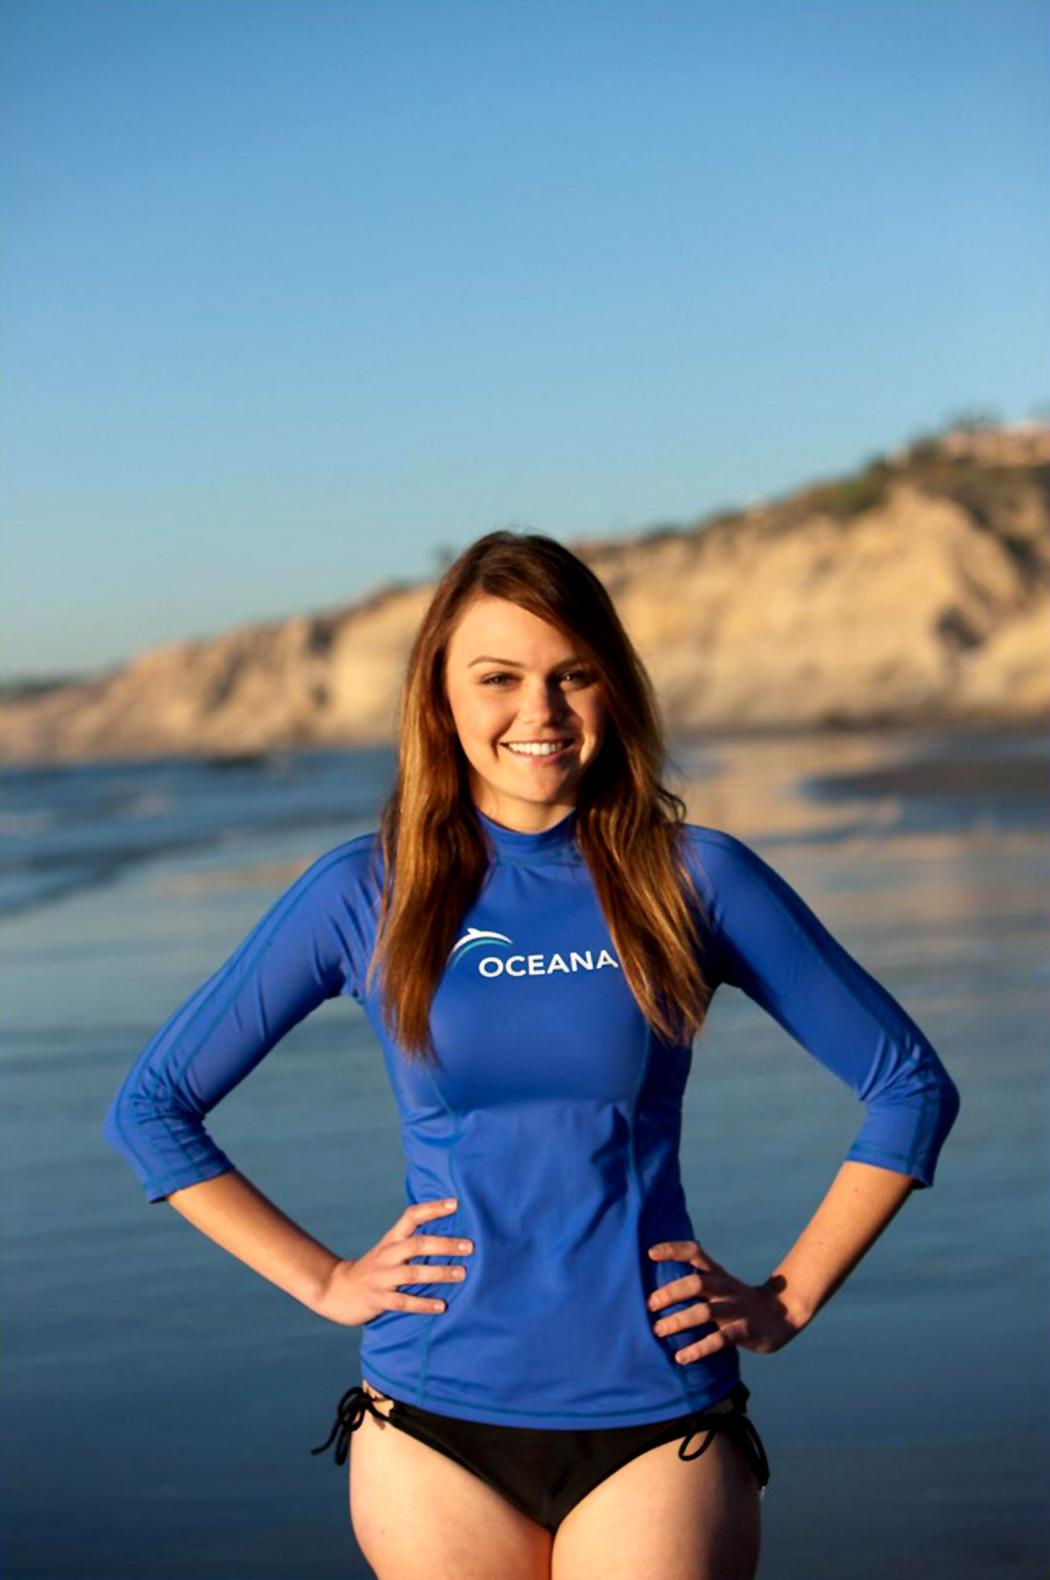 Aimee Teegarden filming a PSA for Oceana